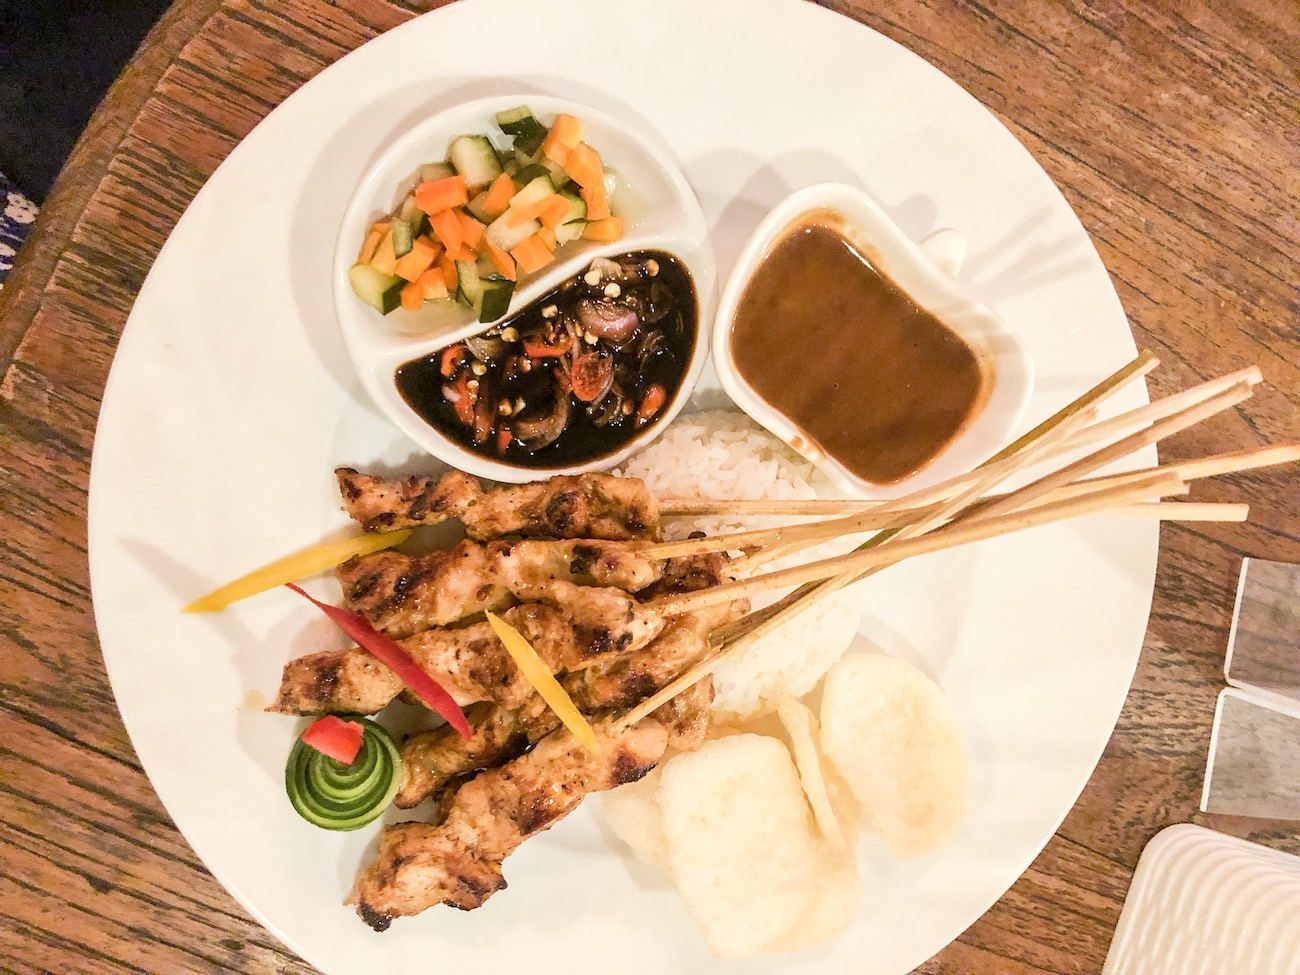 north-bali-food-2.JPG